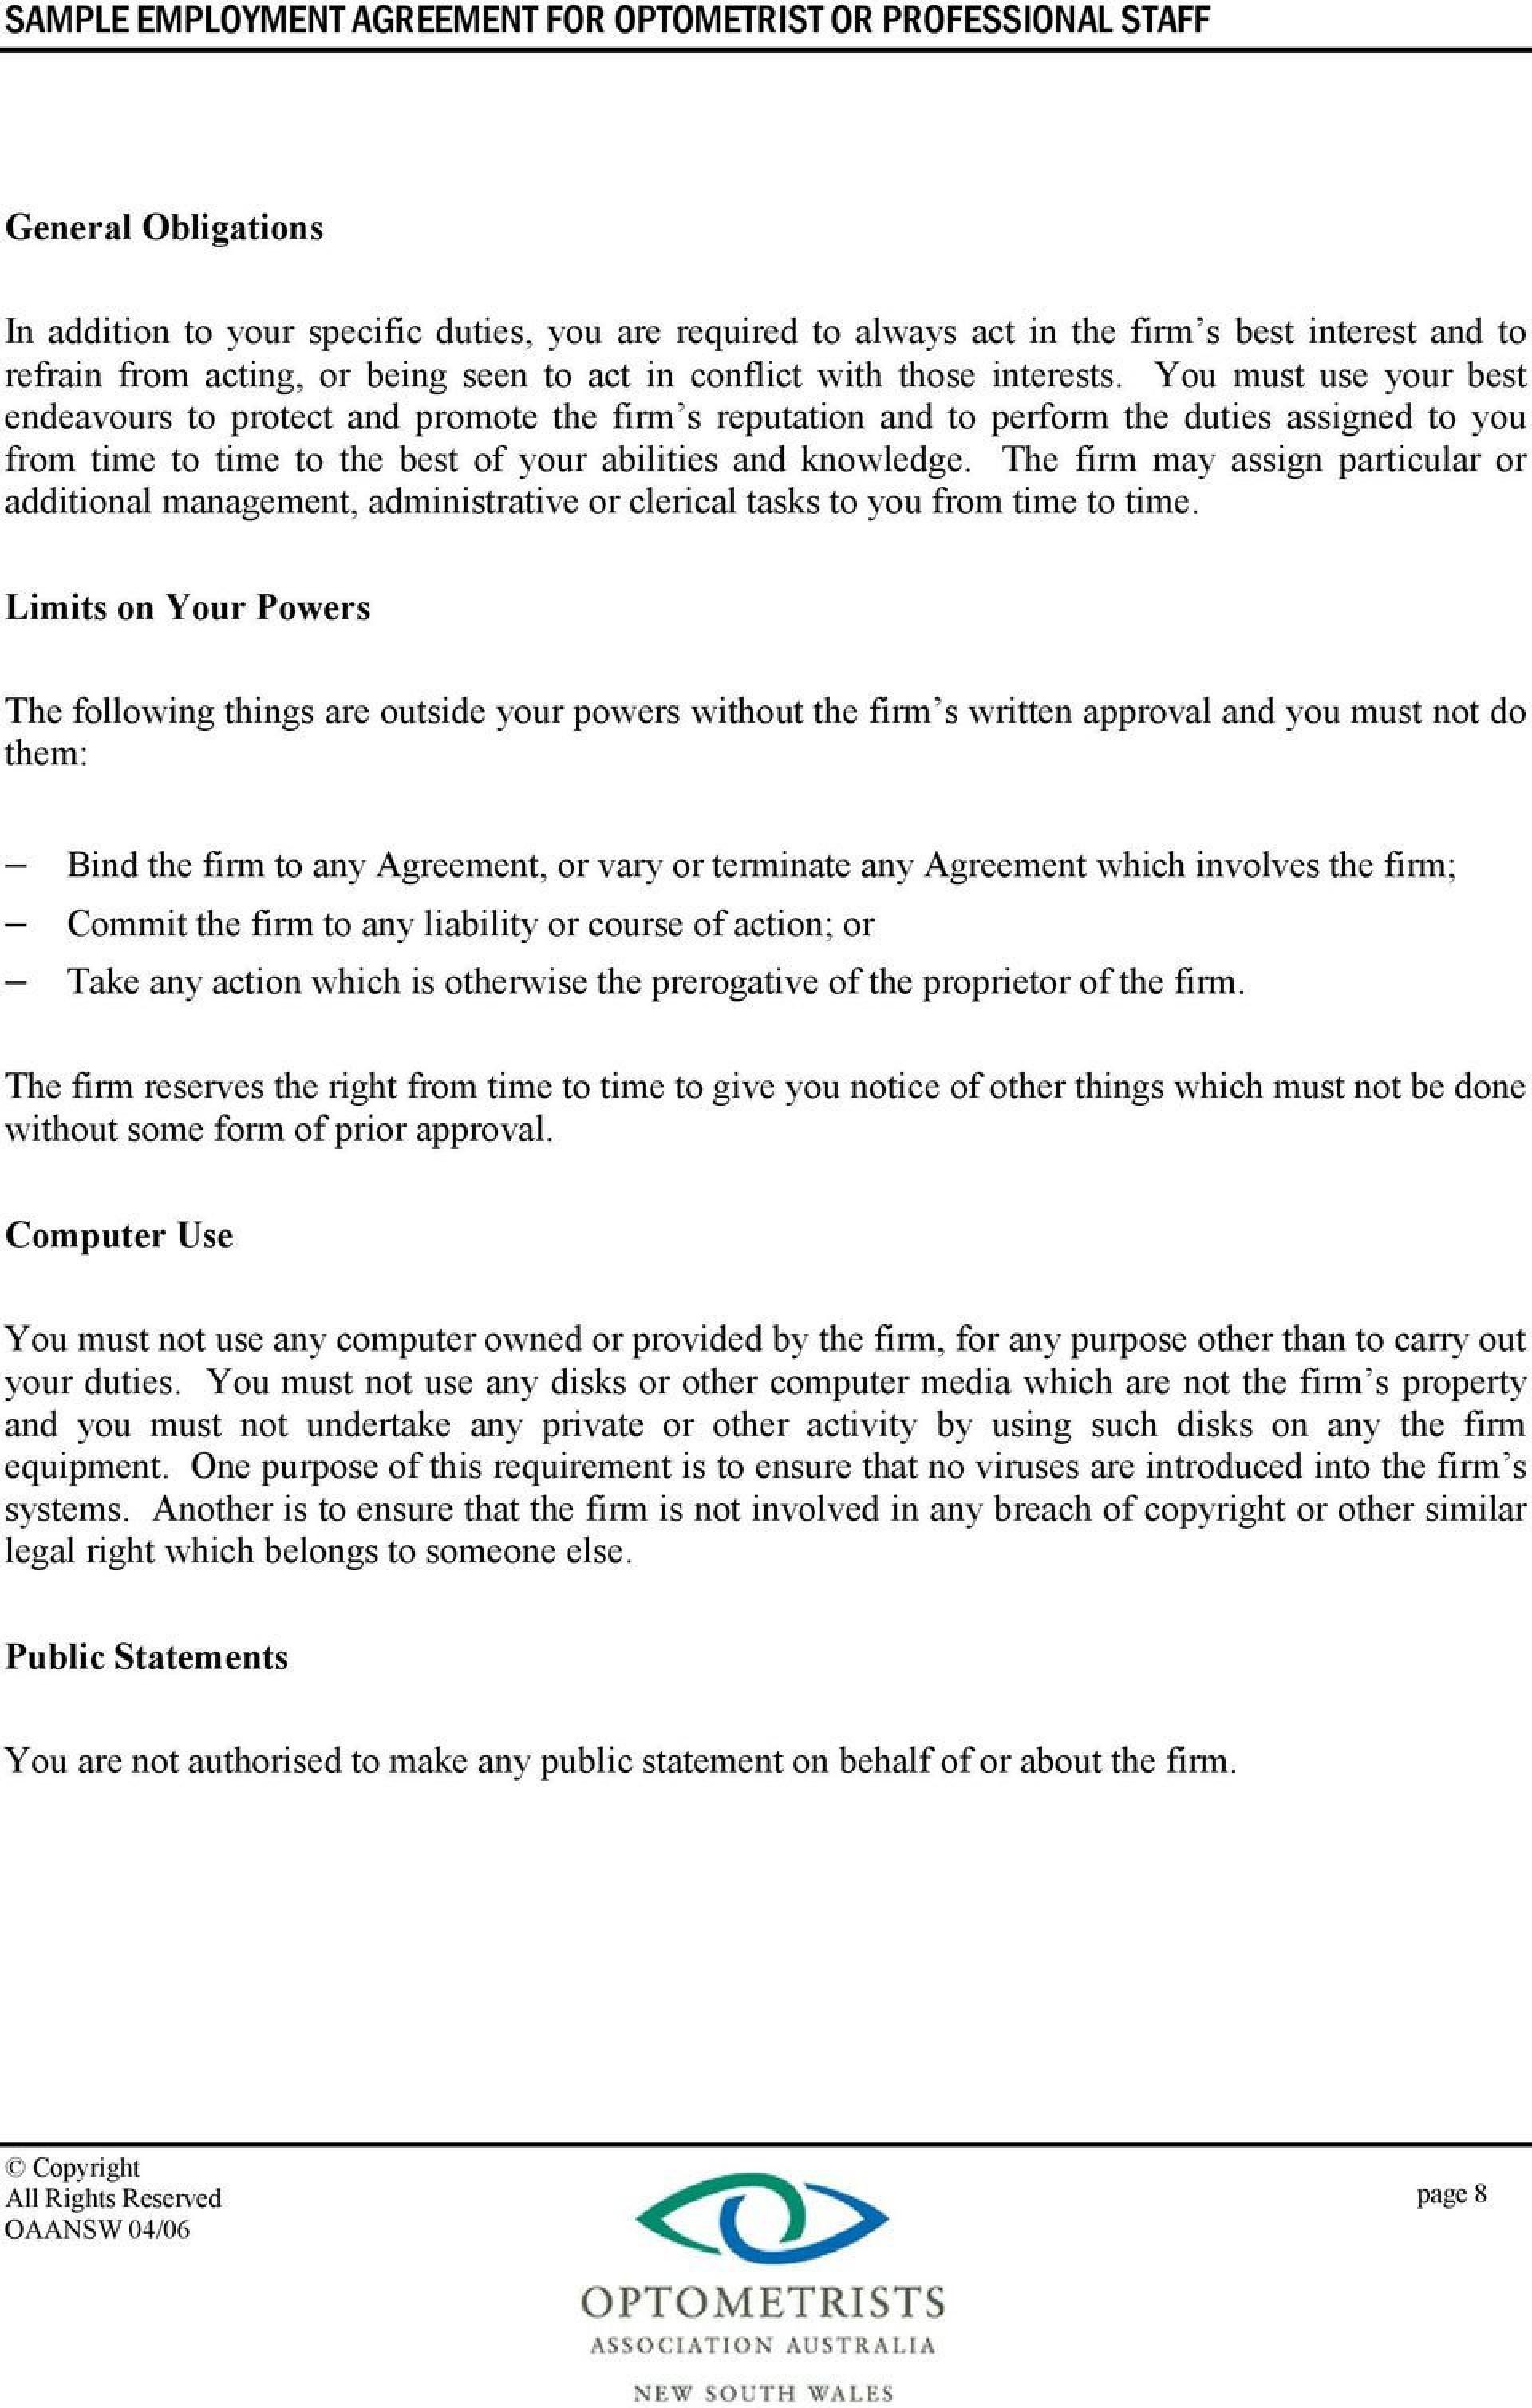 007 Wondrou Free Casual Employment Contract Template Australia Sample 1920